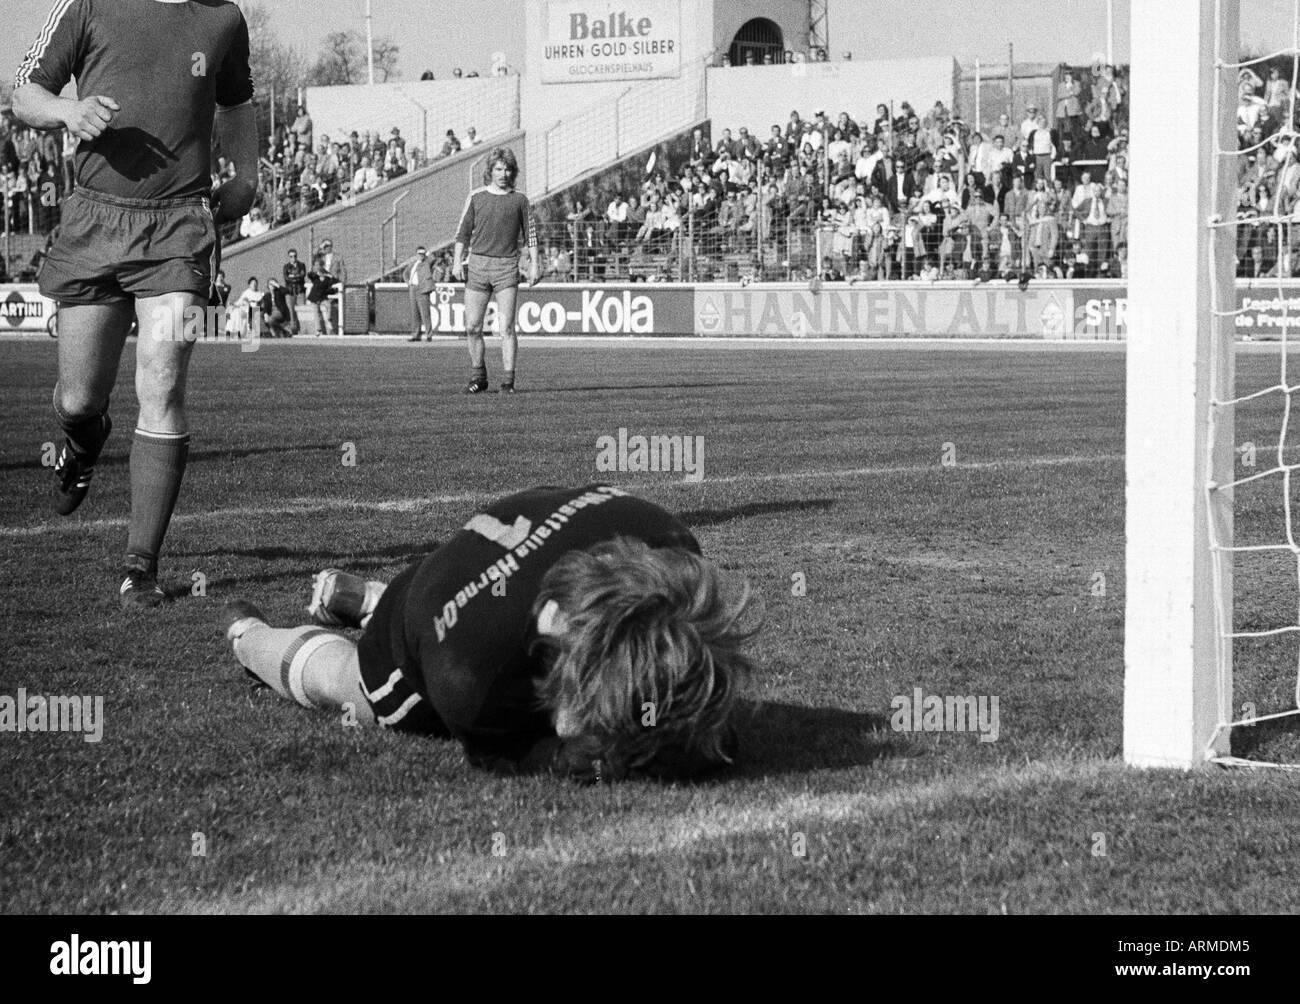 football, Regionalliga West, 1973/1974, Niederrhein Stadium in Oberhausen, Rot-Weiss Oberhausen versus Westfalia Herne 5:0, scene of the match, save by keeper Bernhard Hartmann (Herne), behind Werner Greth (RWO) - Stock Image